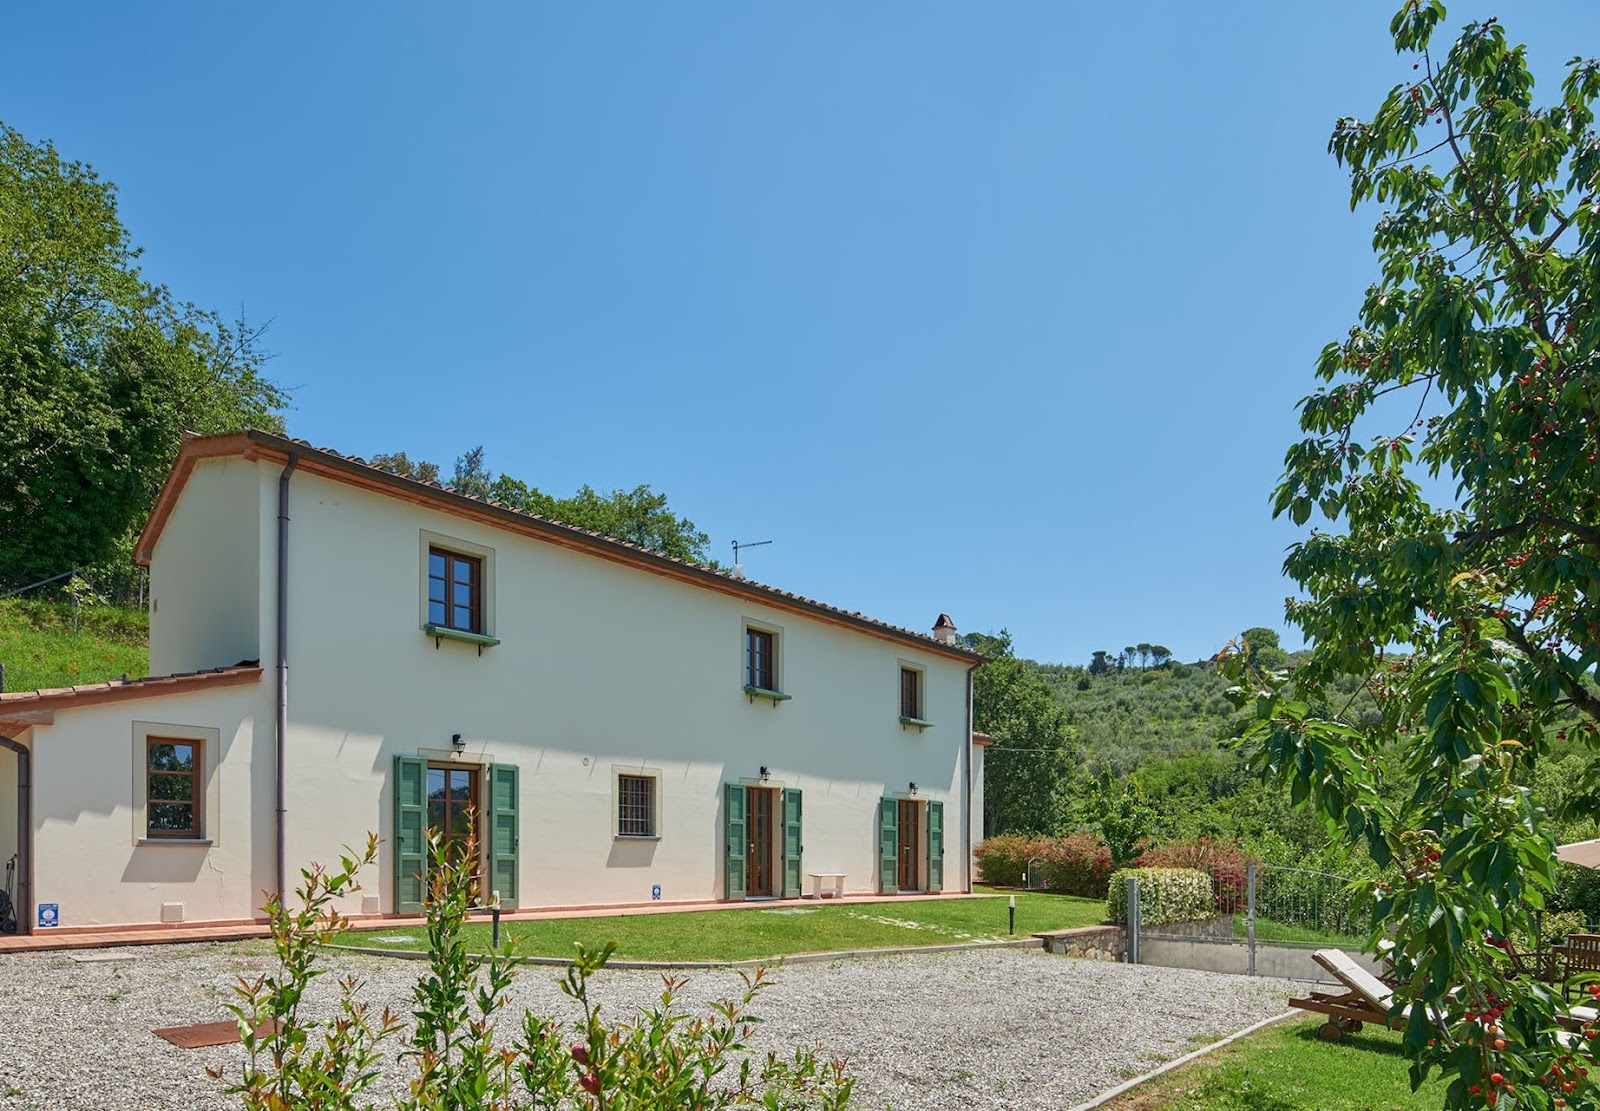 Ferienhaus Corte Paradiso (2570342), Monsummano Terme, Pistoia, Toskana, Italien, Bild 10